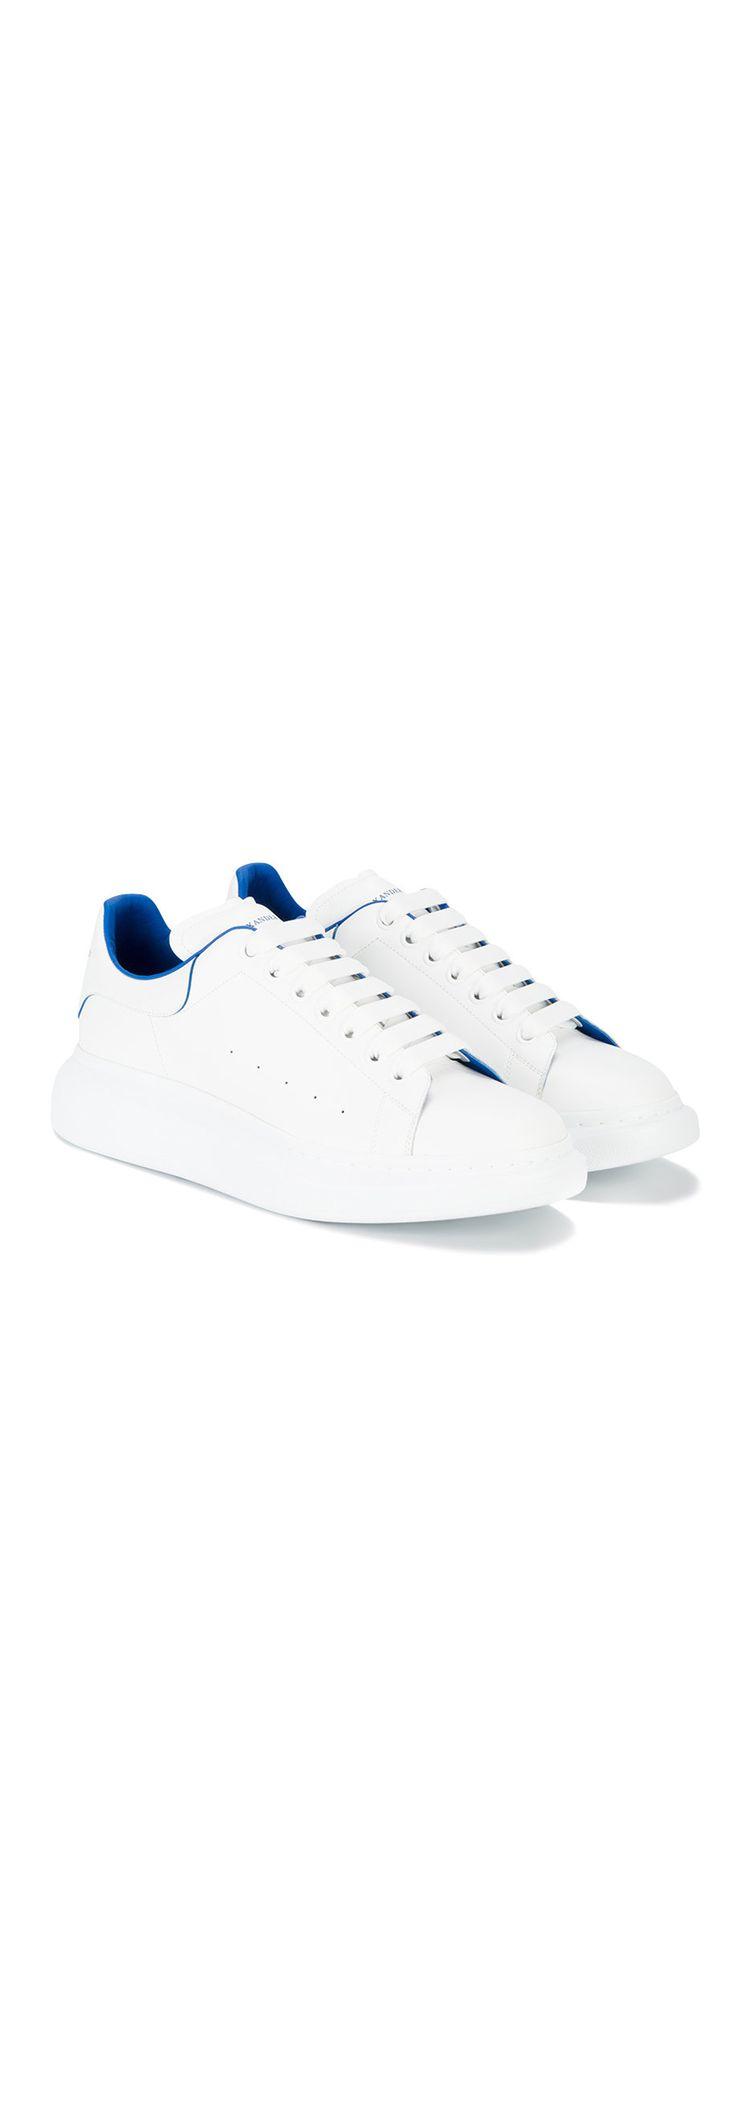 ALEXANDER MCQUEEN blue trim oversized sole sneakers, explore the latest new season sneakers on Farfetch.